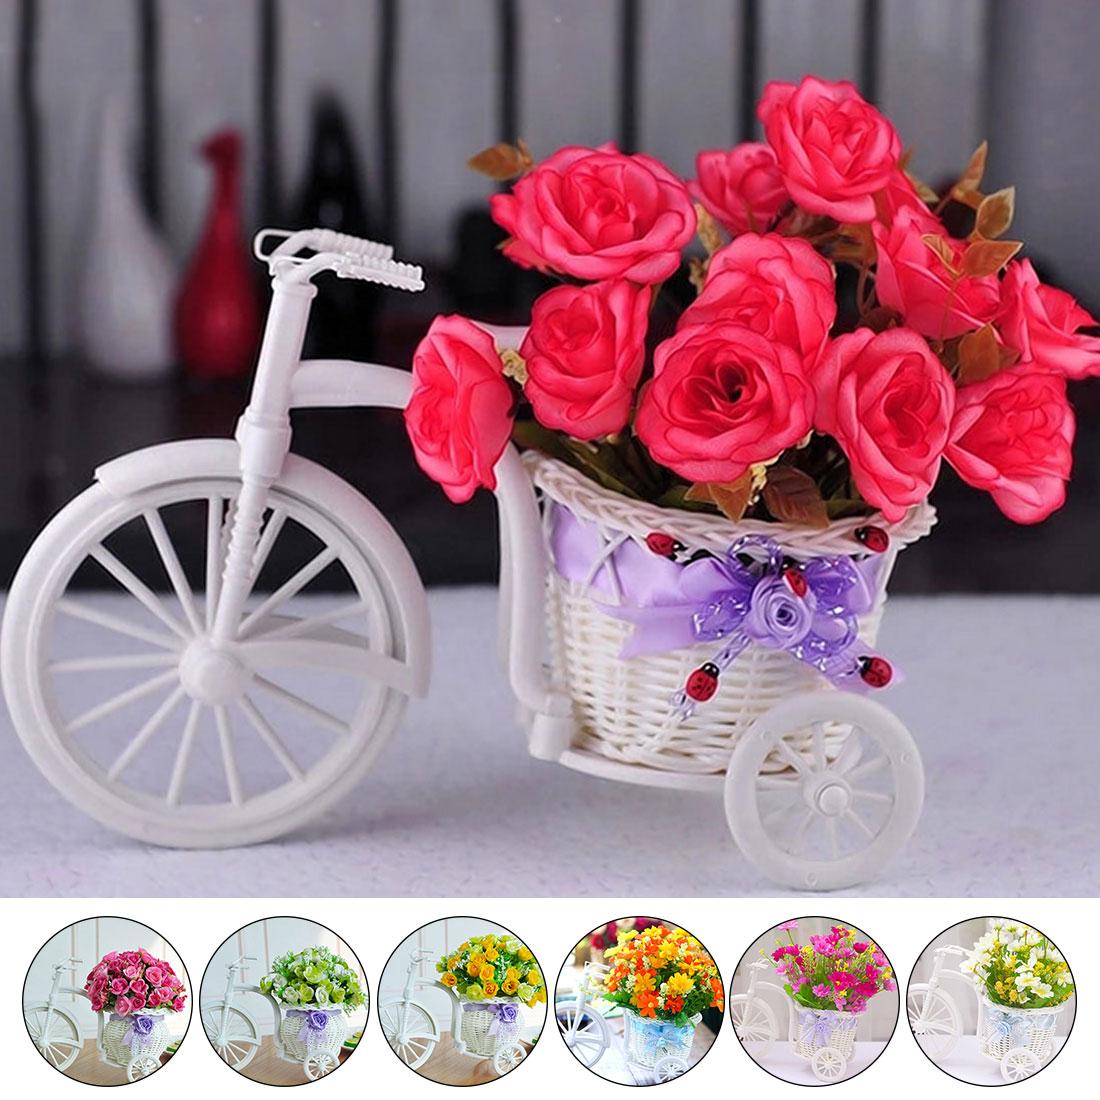 Floral Wedding Card Manufacturer From Hosur: Aliexpress.com : Buy 32 Kinds Style Rattan Vase + Flowers